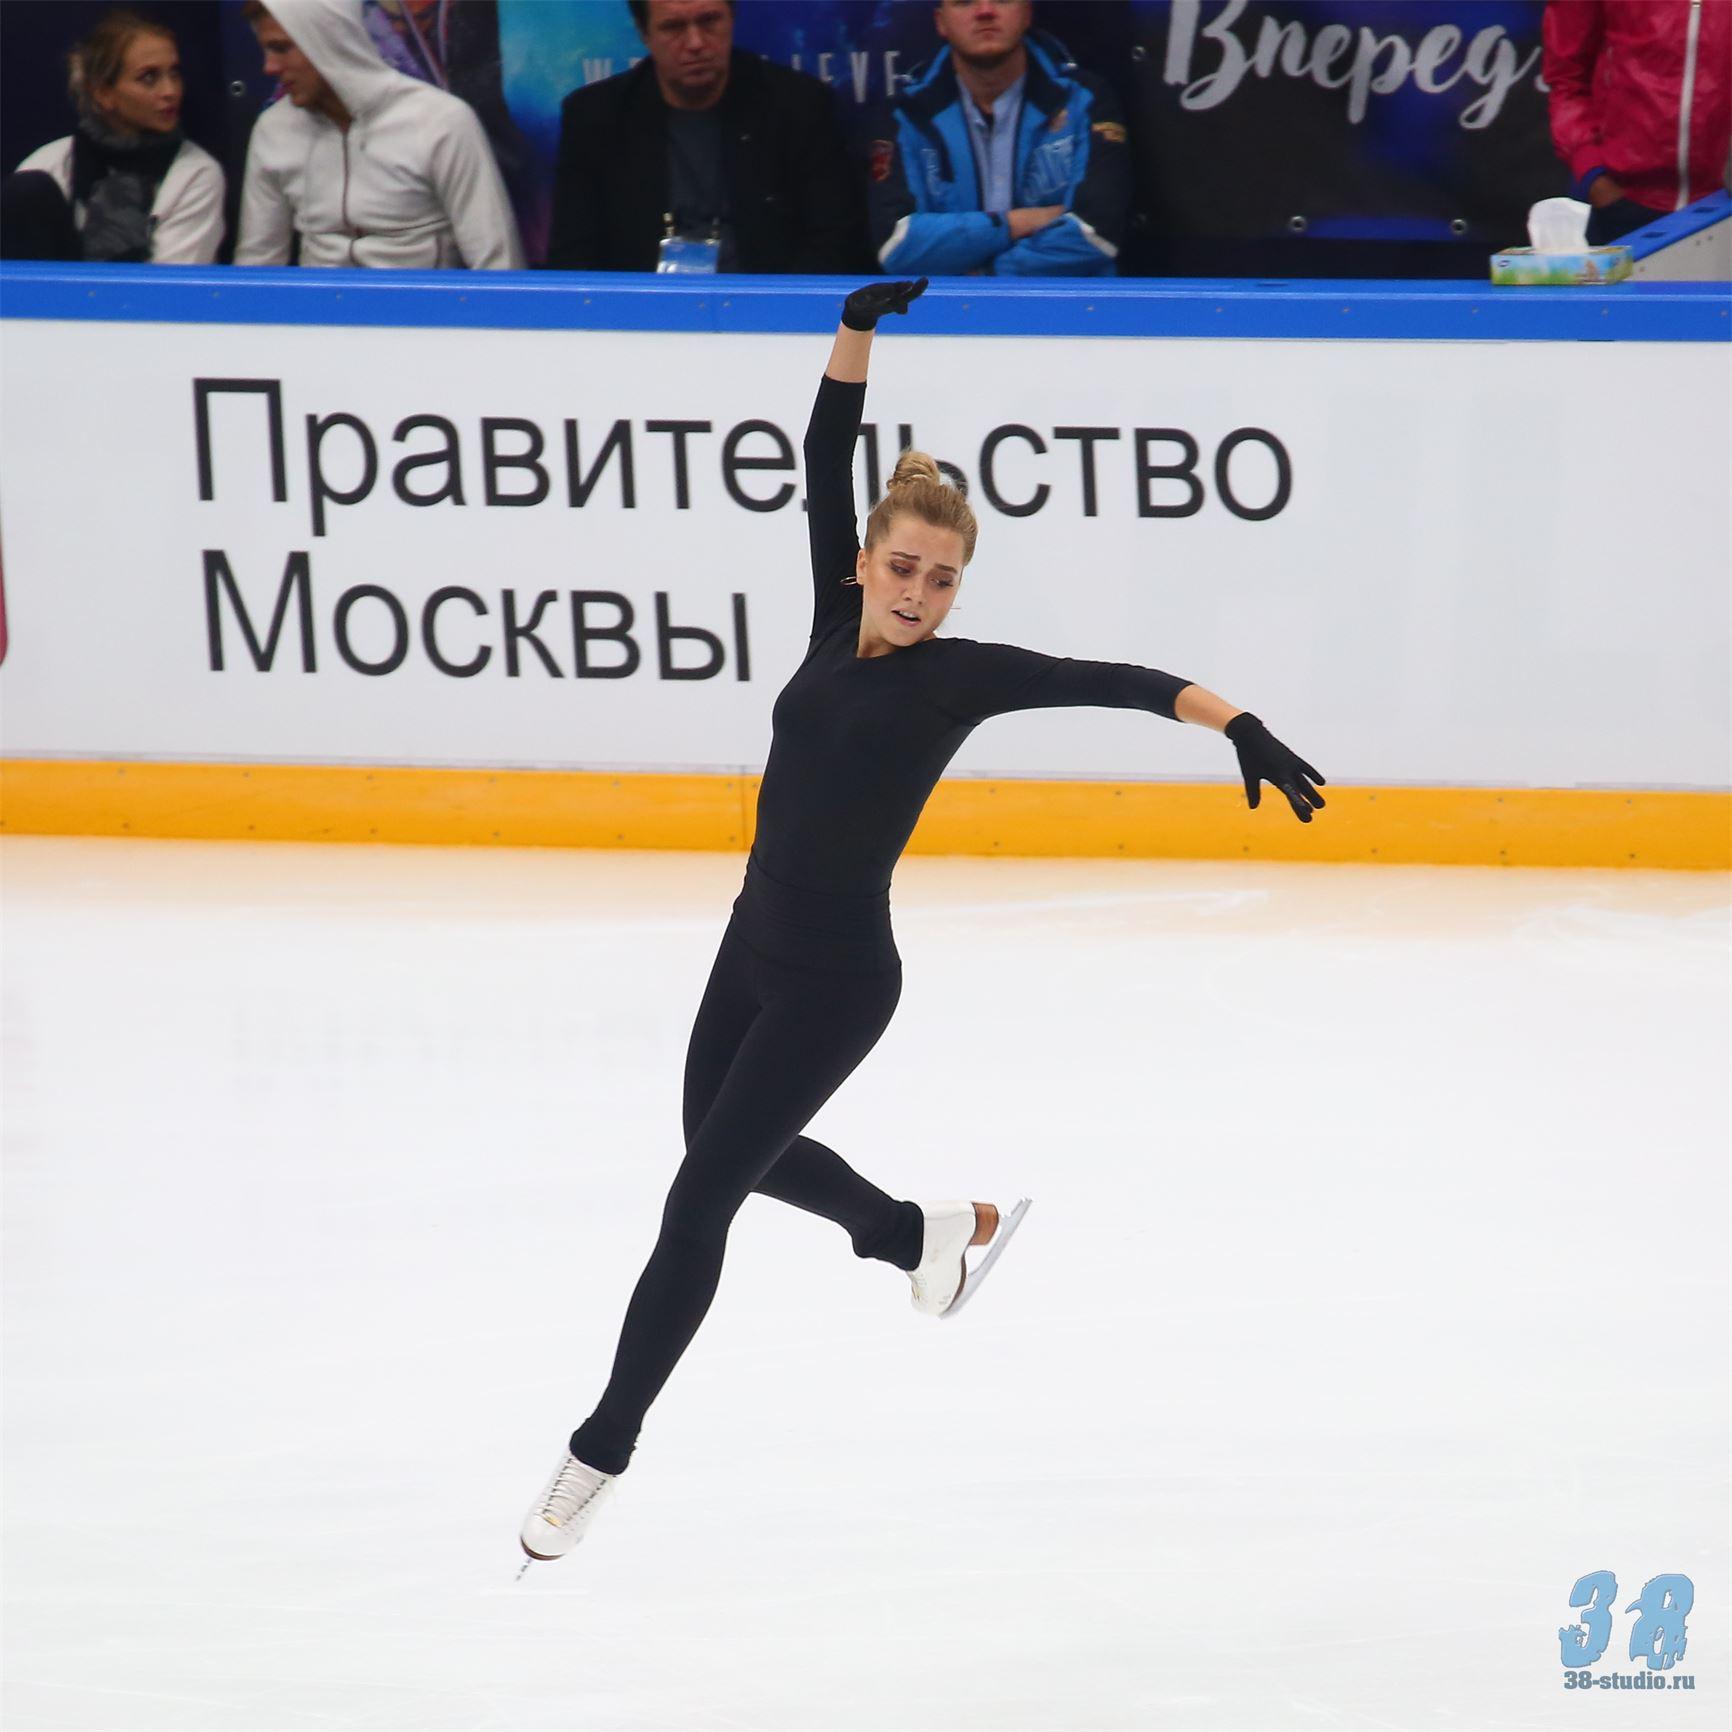 Елена Радионова-4 - Страница 7 OAayYd7BPCE